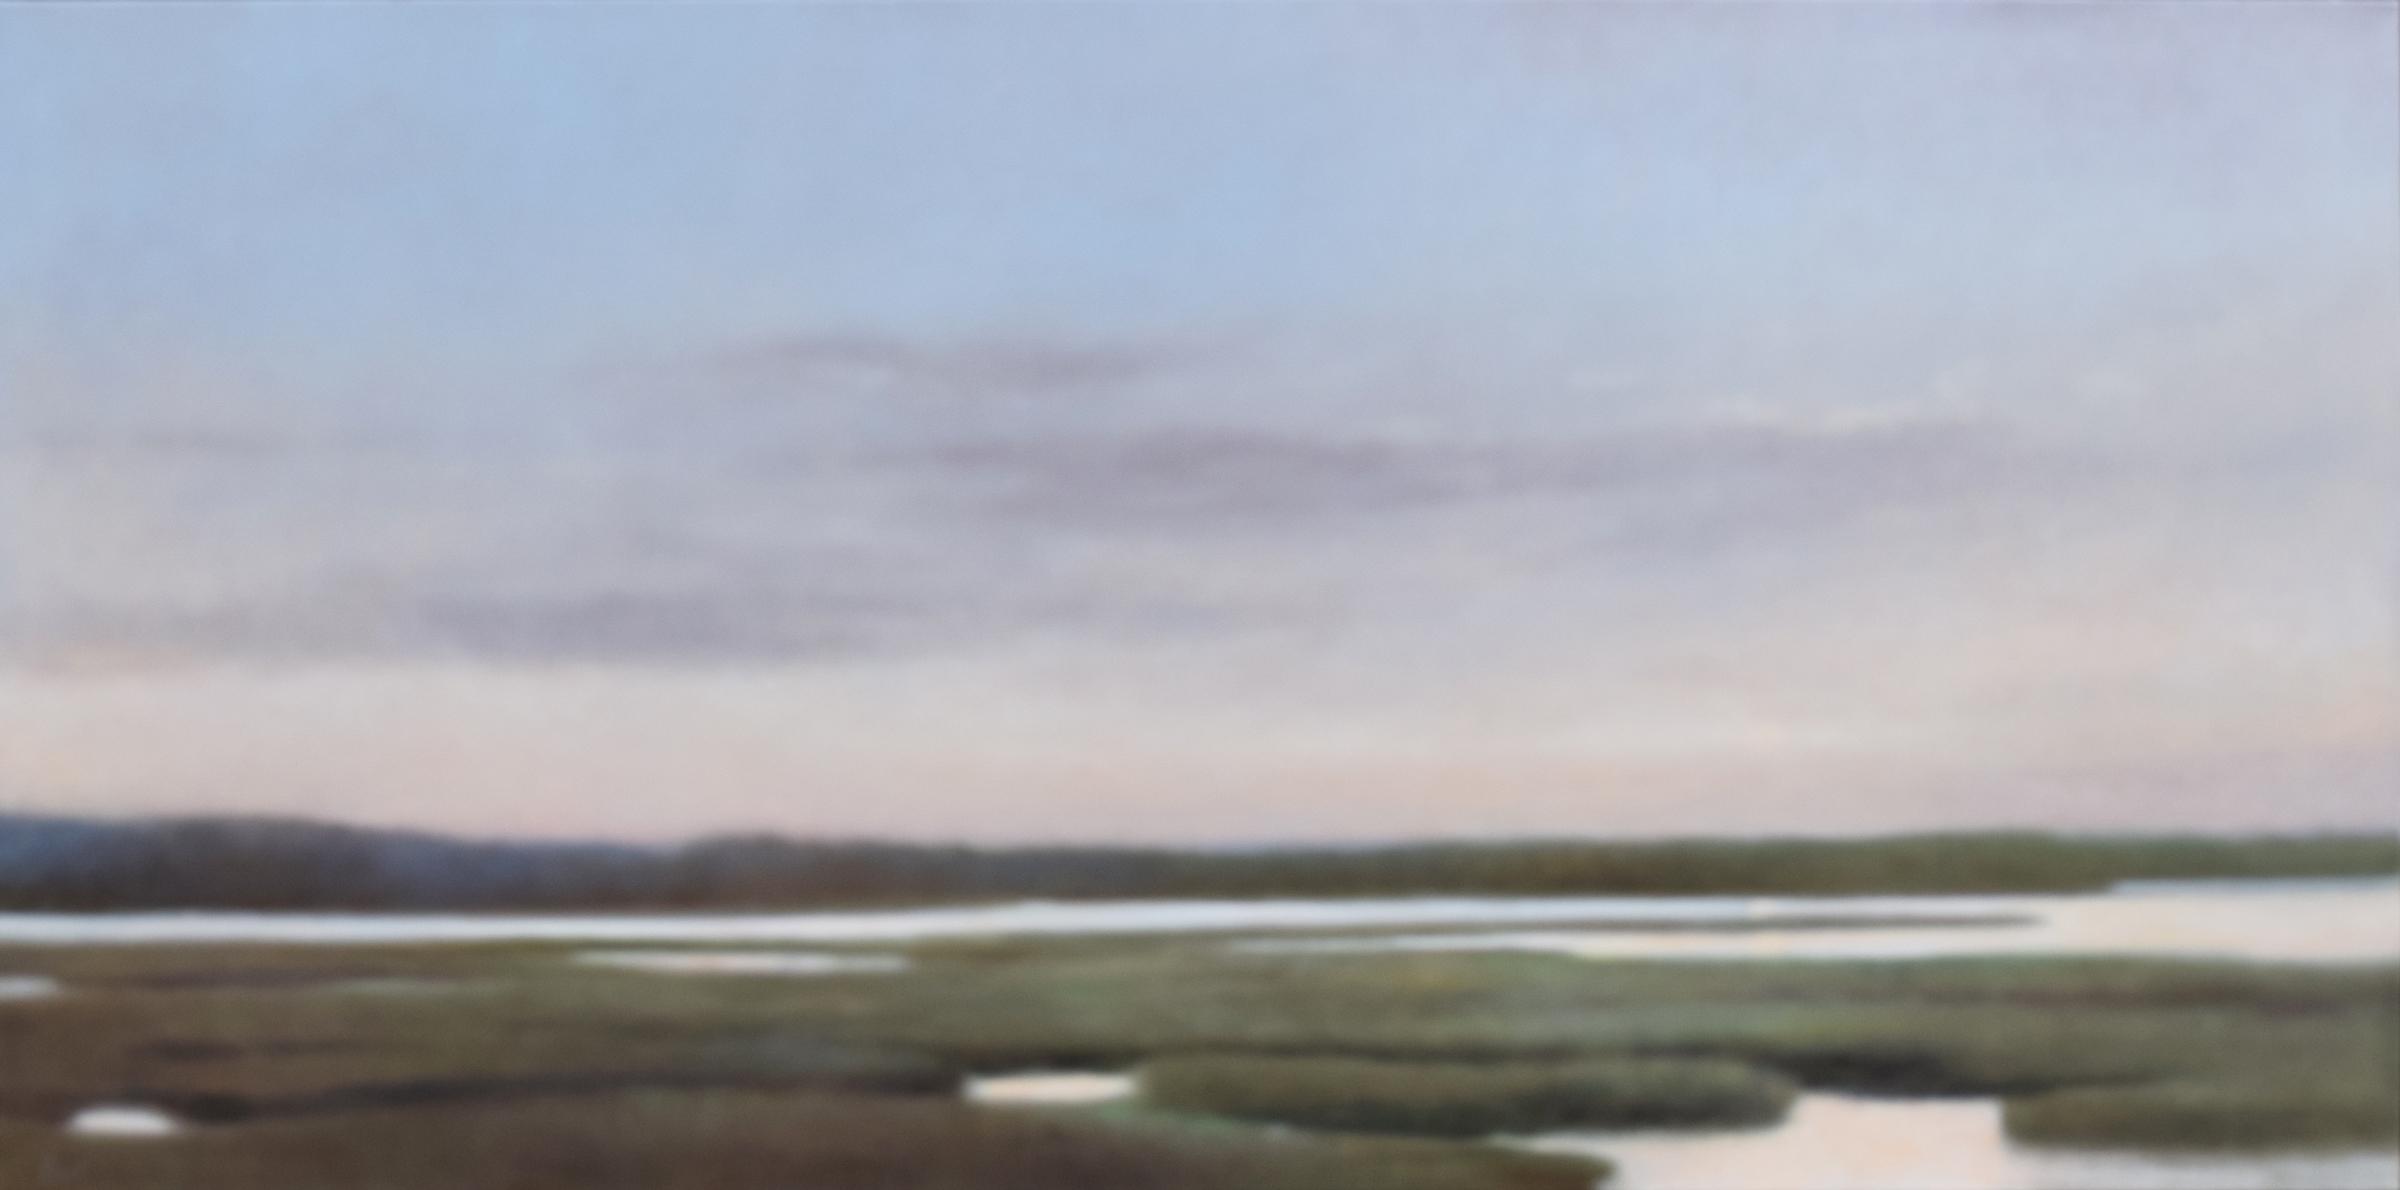 Essex Marshes